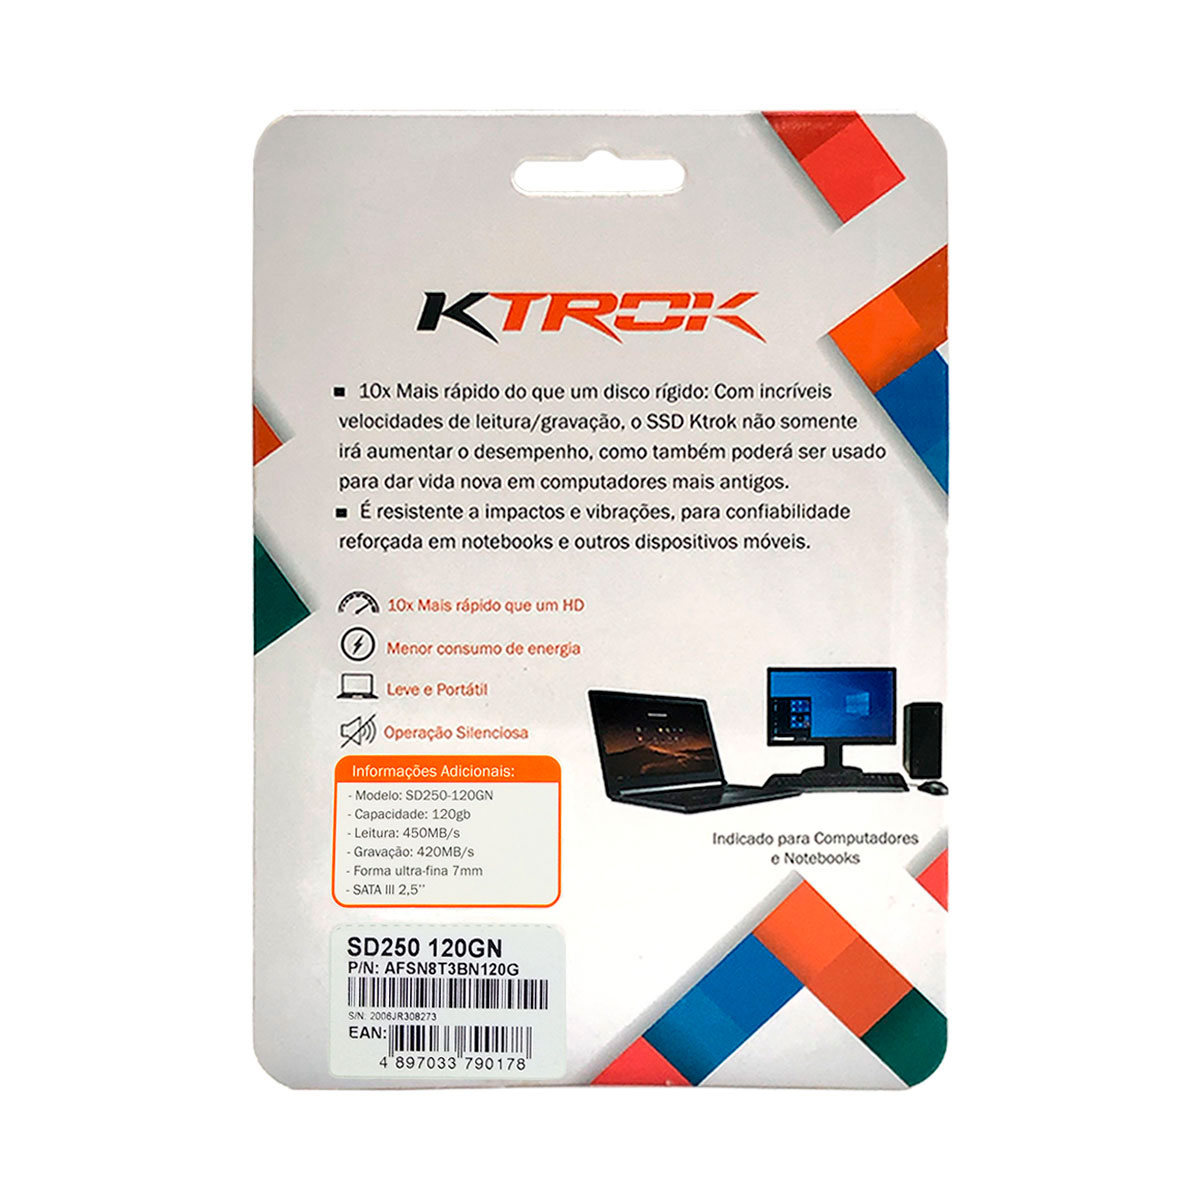 "HD SSD 120GB KTROK SD250-120GN, Leitura 450MB/s, Gravação 420 MB/s, 7mm, Sata III 2,5"""